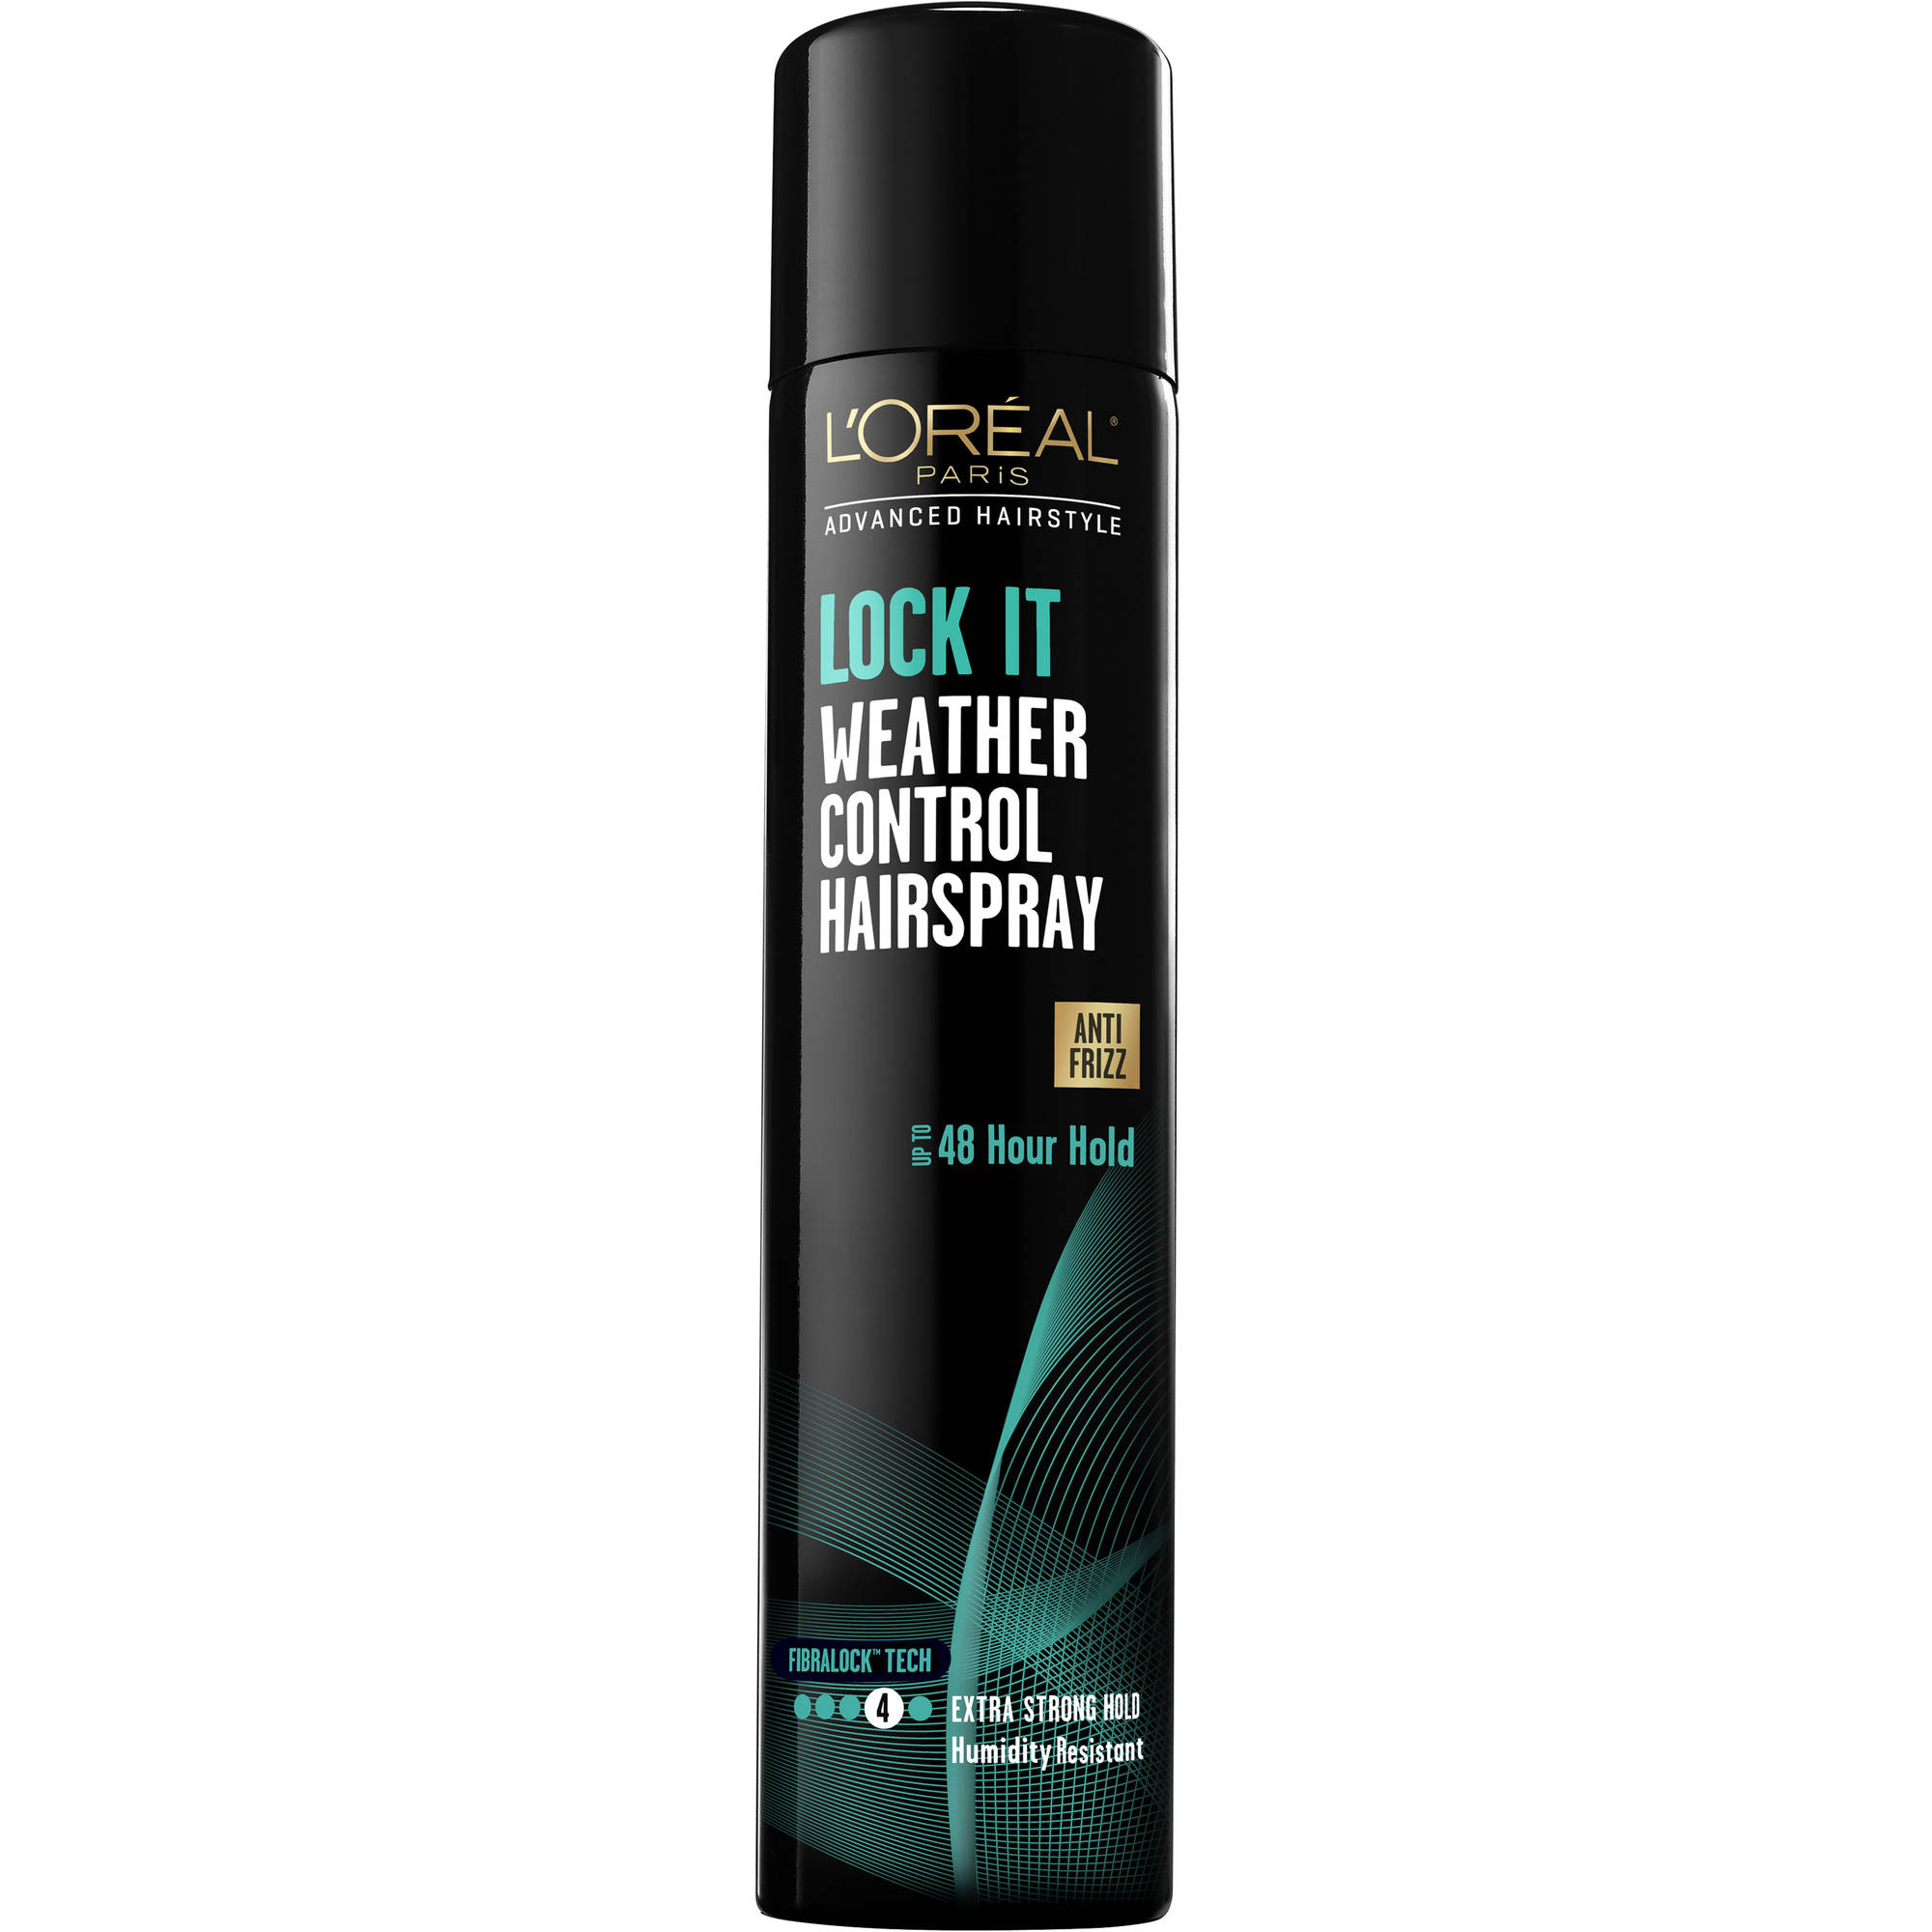 L'Oreal Paris Advanced Hairstyle LOCK IT Weather Control Hairspray 8.25 OZ